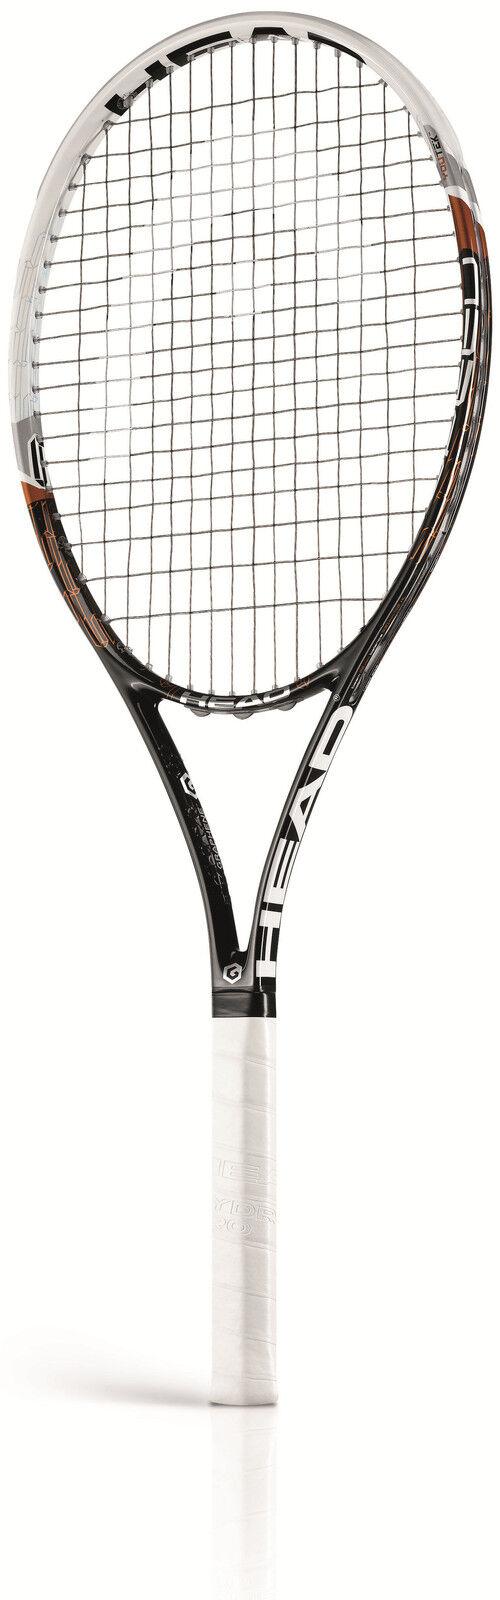 Head Graphene Velocidad S-Youtek raqueta de Tenis Raqueta-garantía distribuidor - 4 1 2